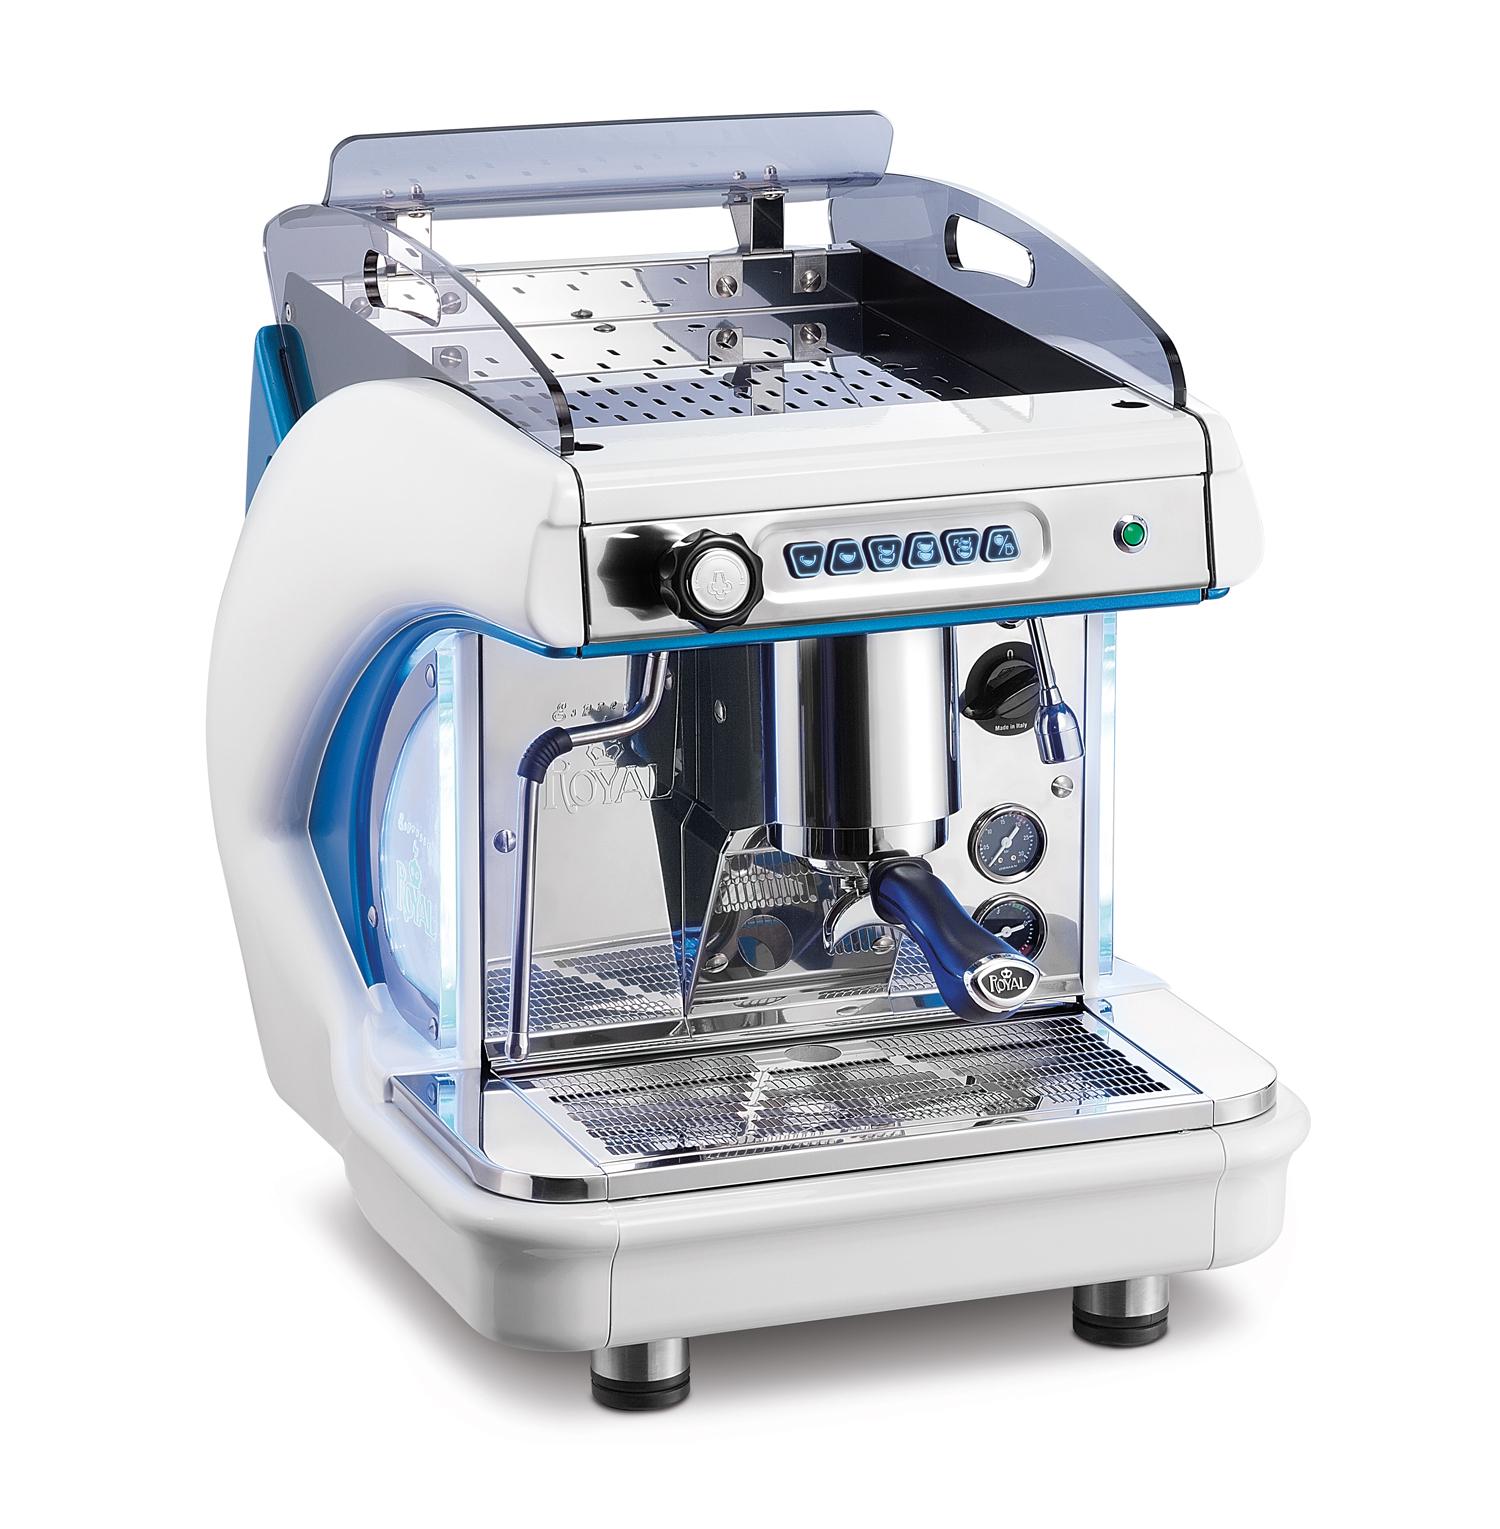 Kávovary - jednopákové